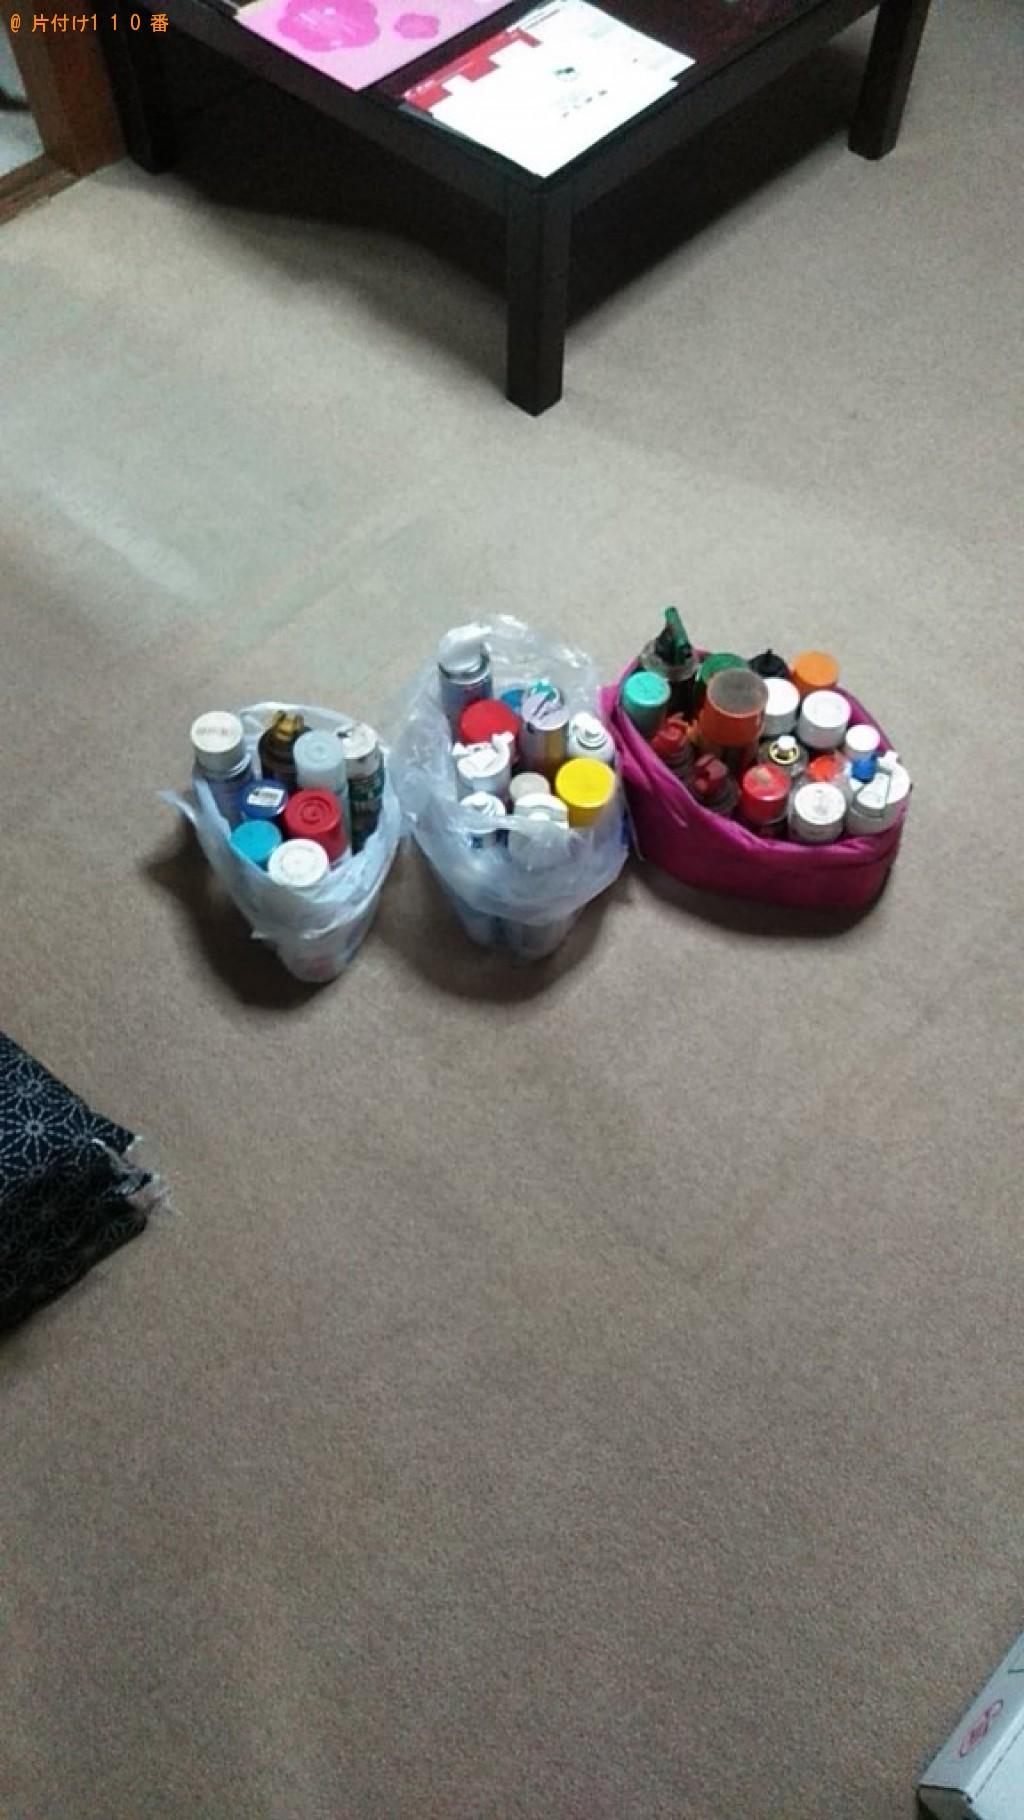 【今治市共栄町】スプレー缶の出張不用品回収・処分ご依頼